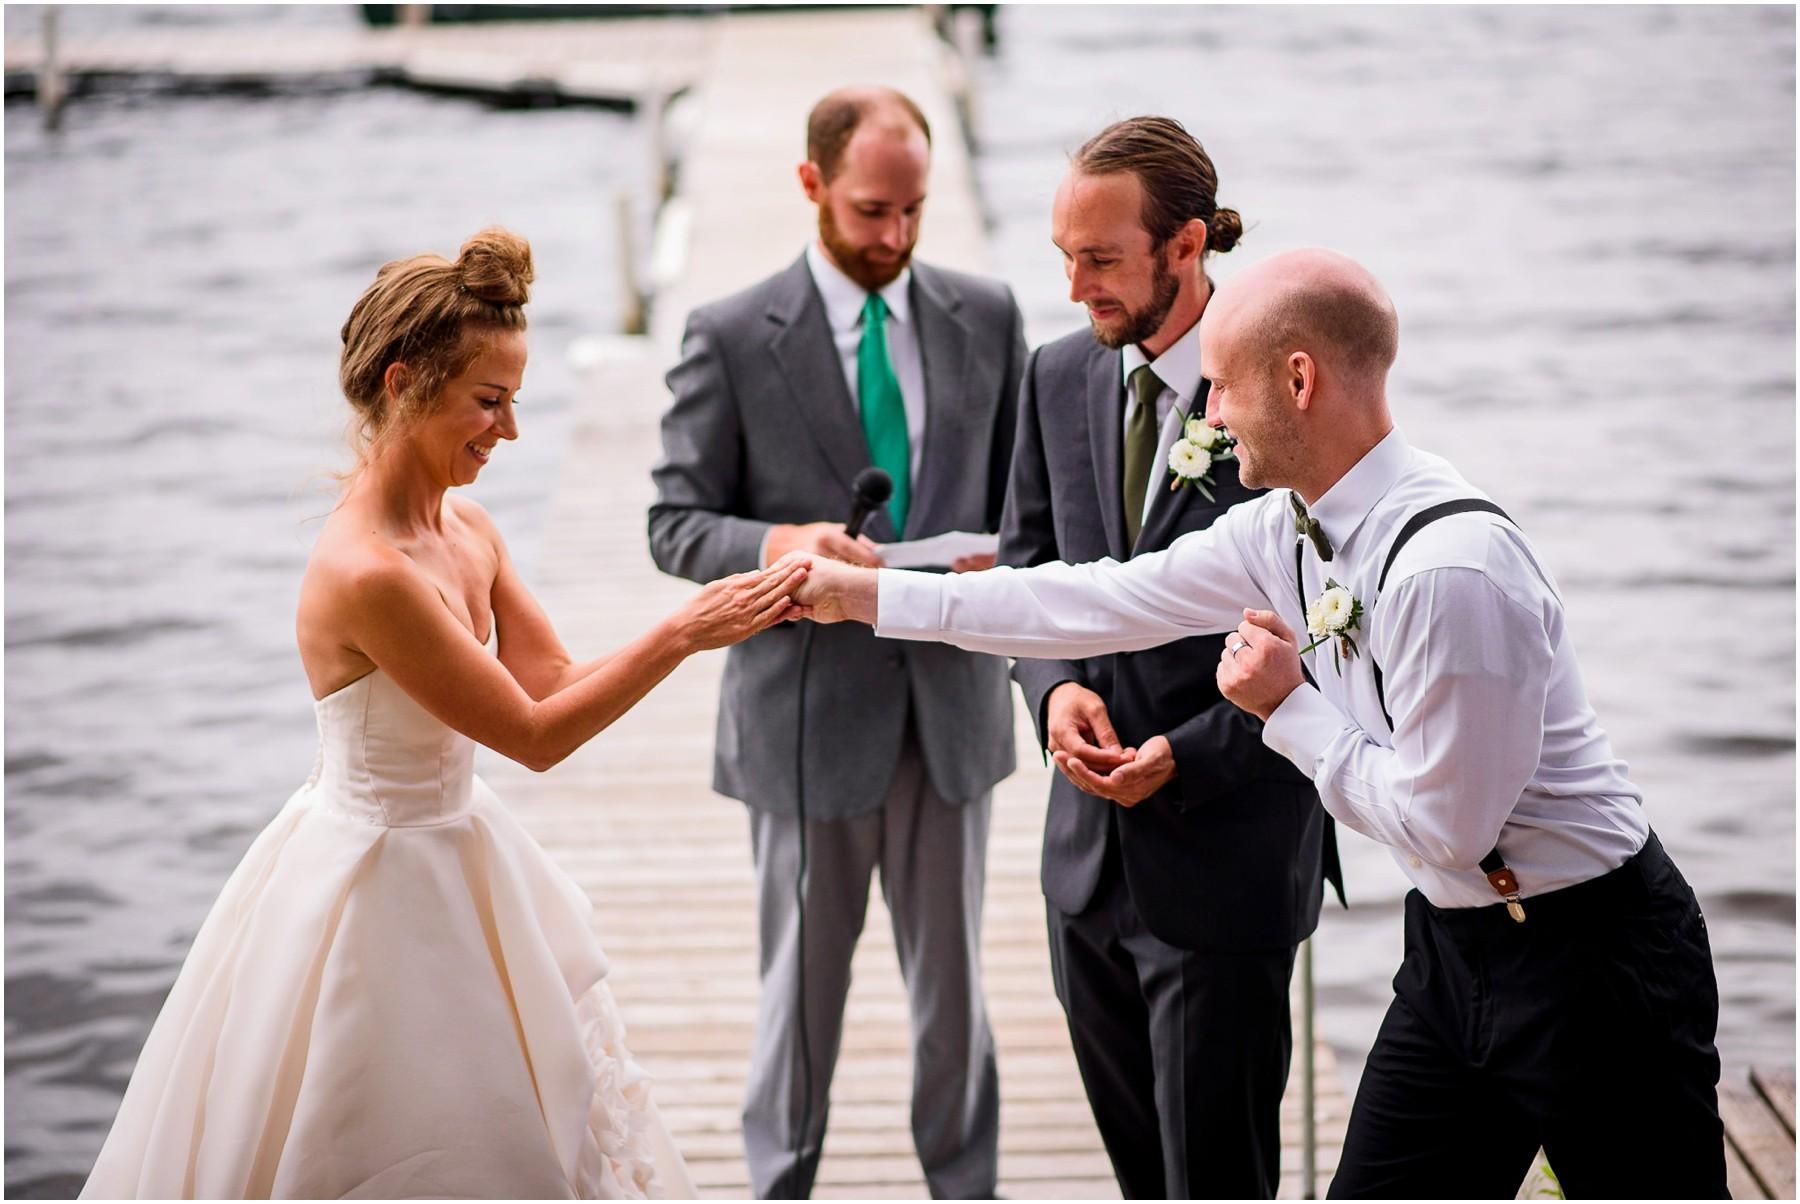 Wisconsin Lake Wedding ceremony